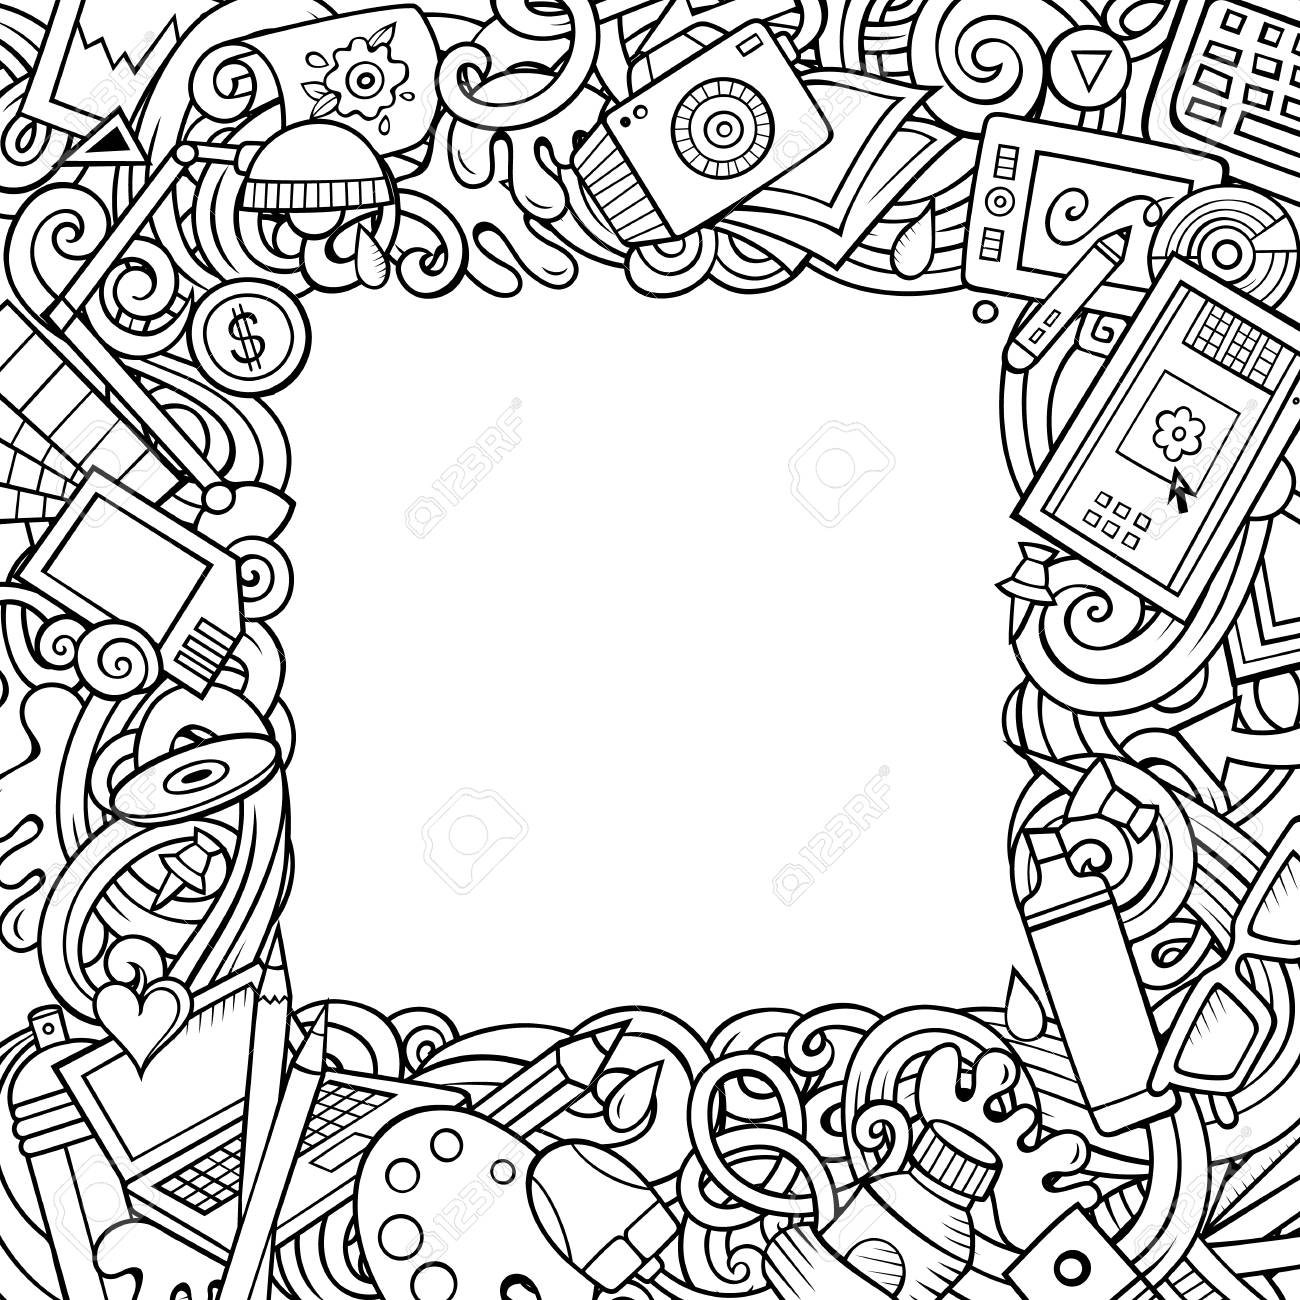 Vector De Dibujos Animados Garabatos Marco De Diseñador ...